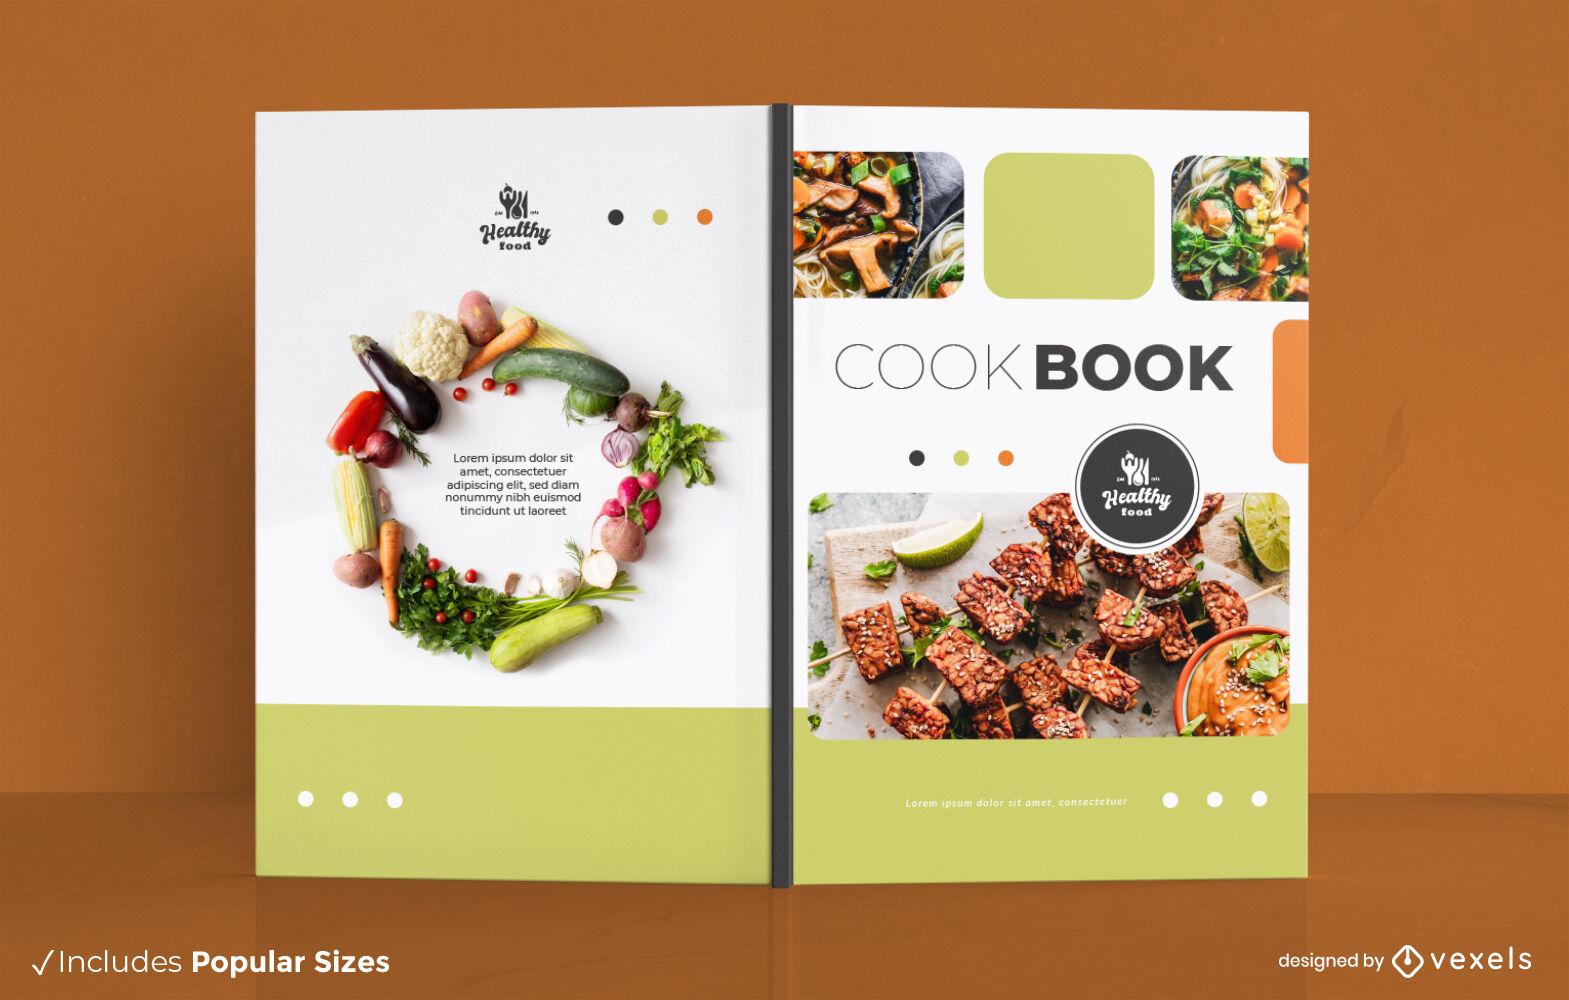 Cooking book recipes book cover design